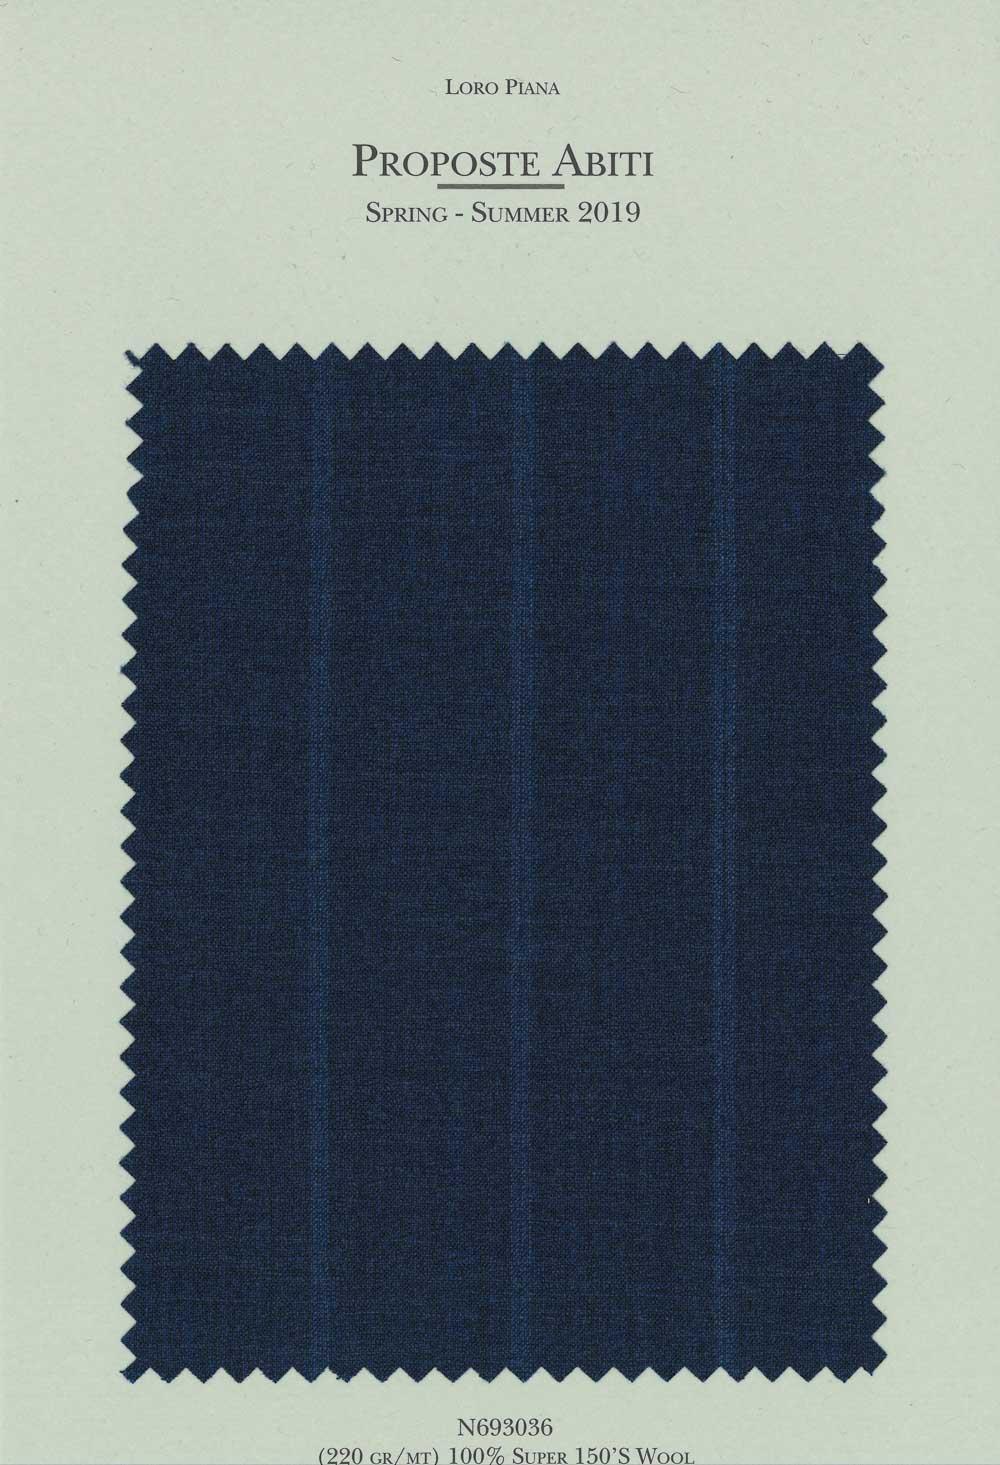 N693036